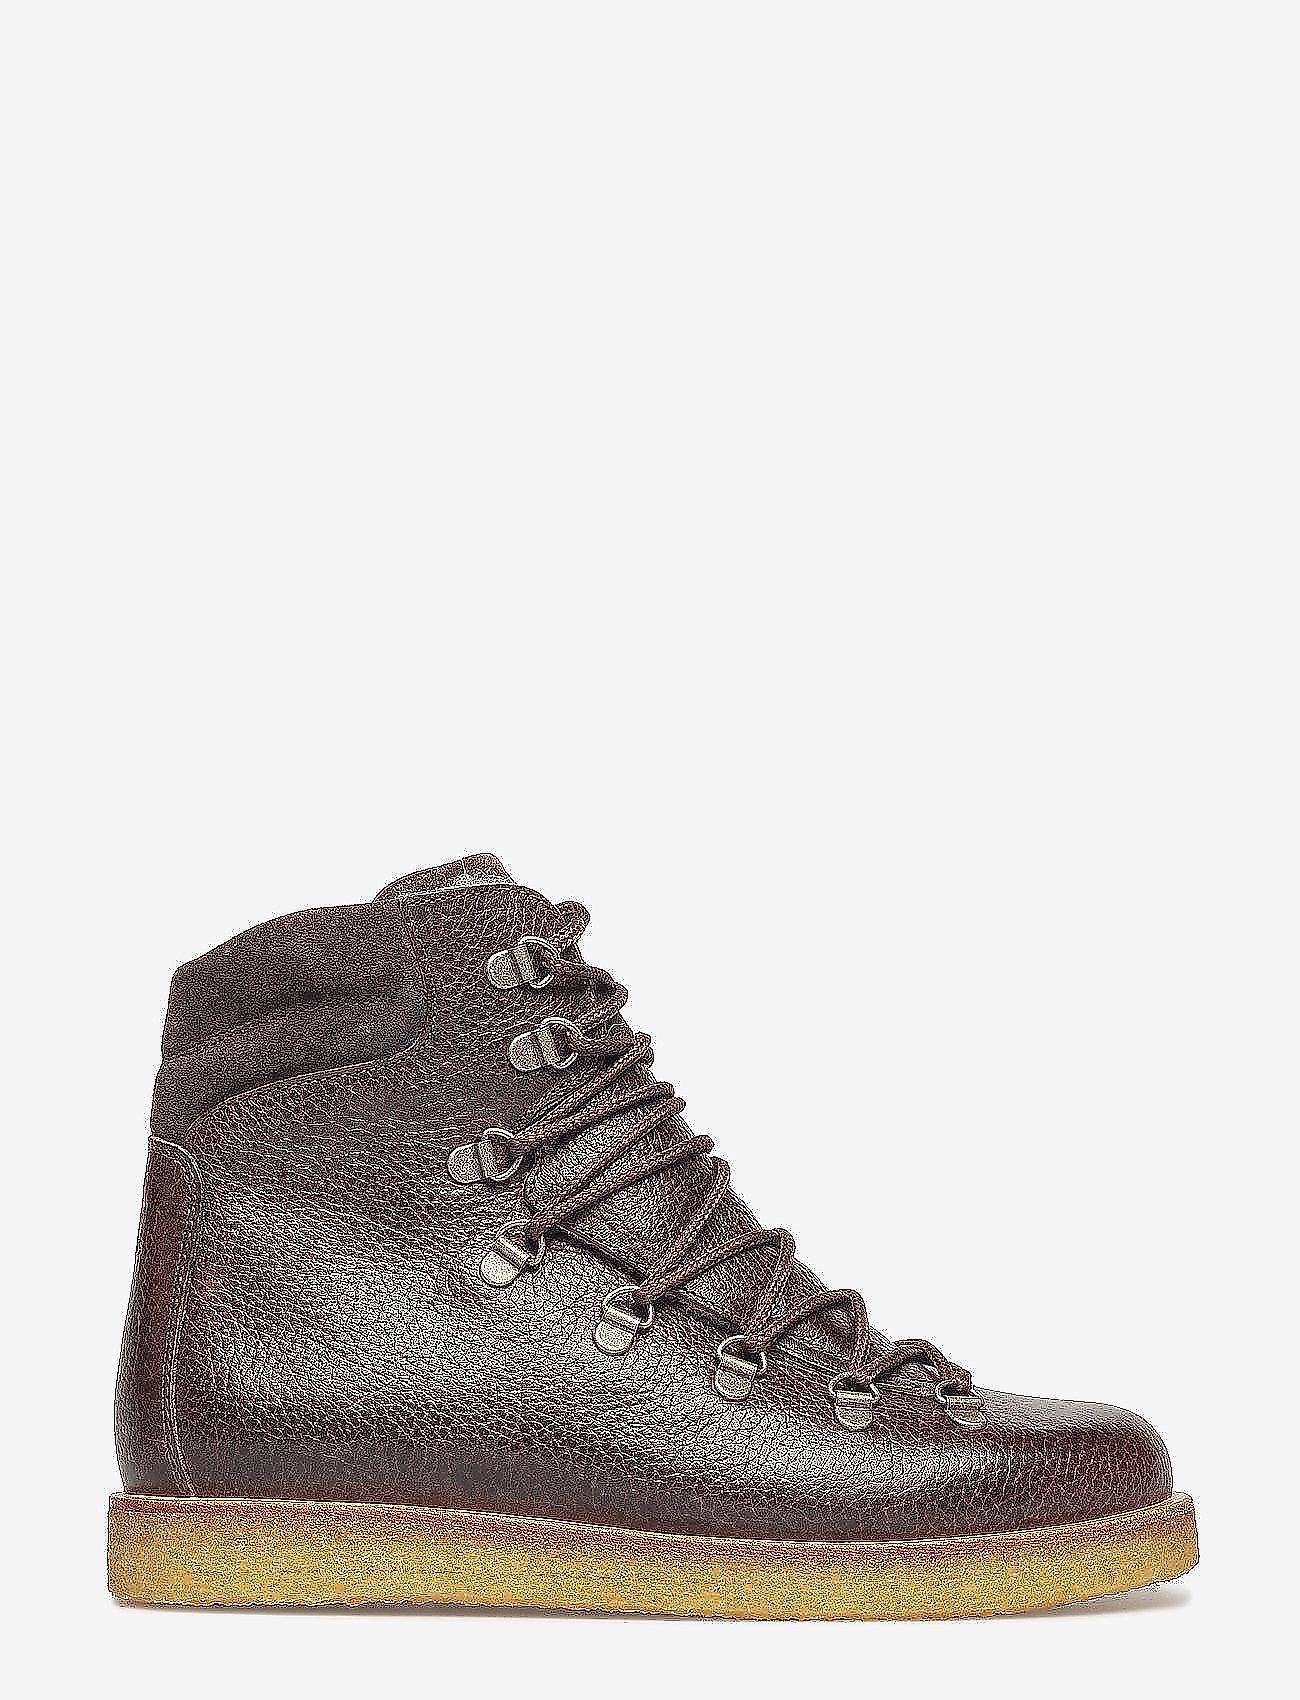 ANGULUS - Boots - flat - with laces - platte enkellaarsjes - 2505/2193 d.brown/d.brown - 1